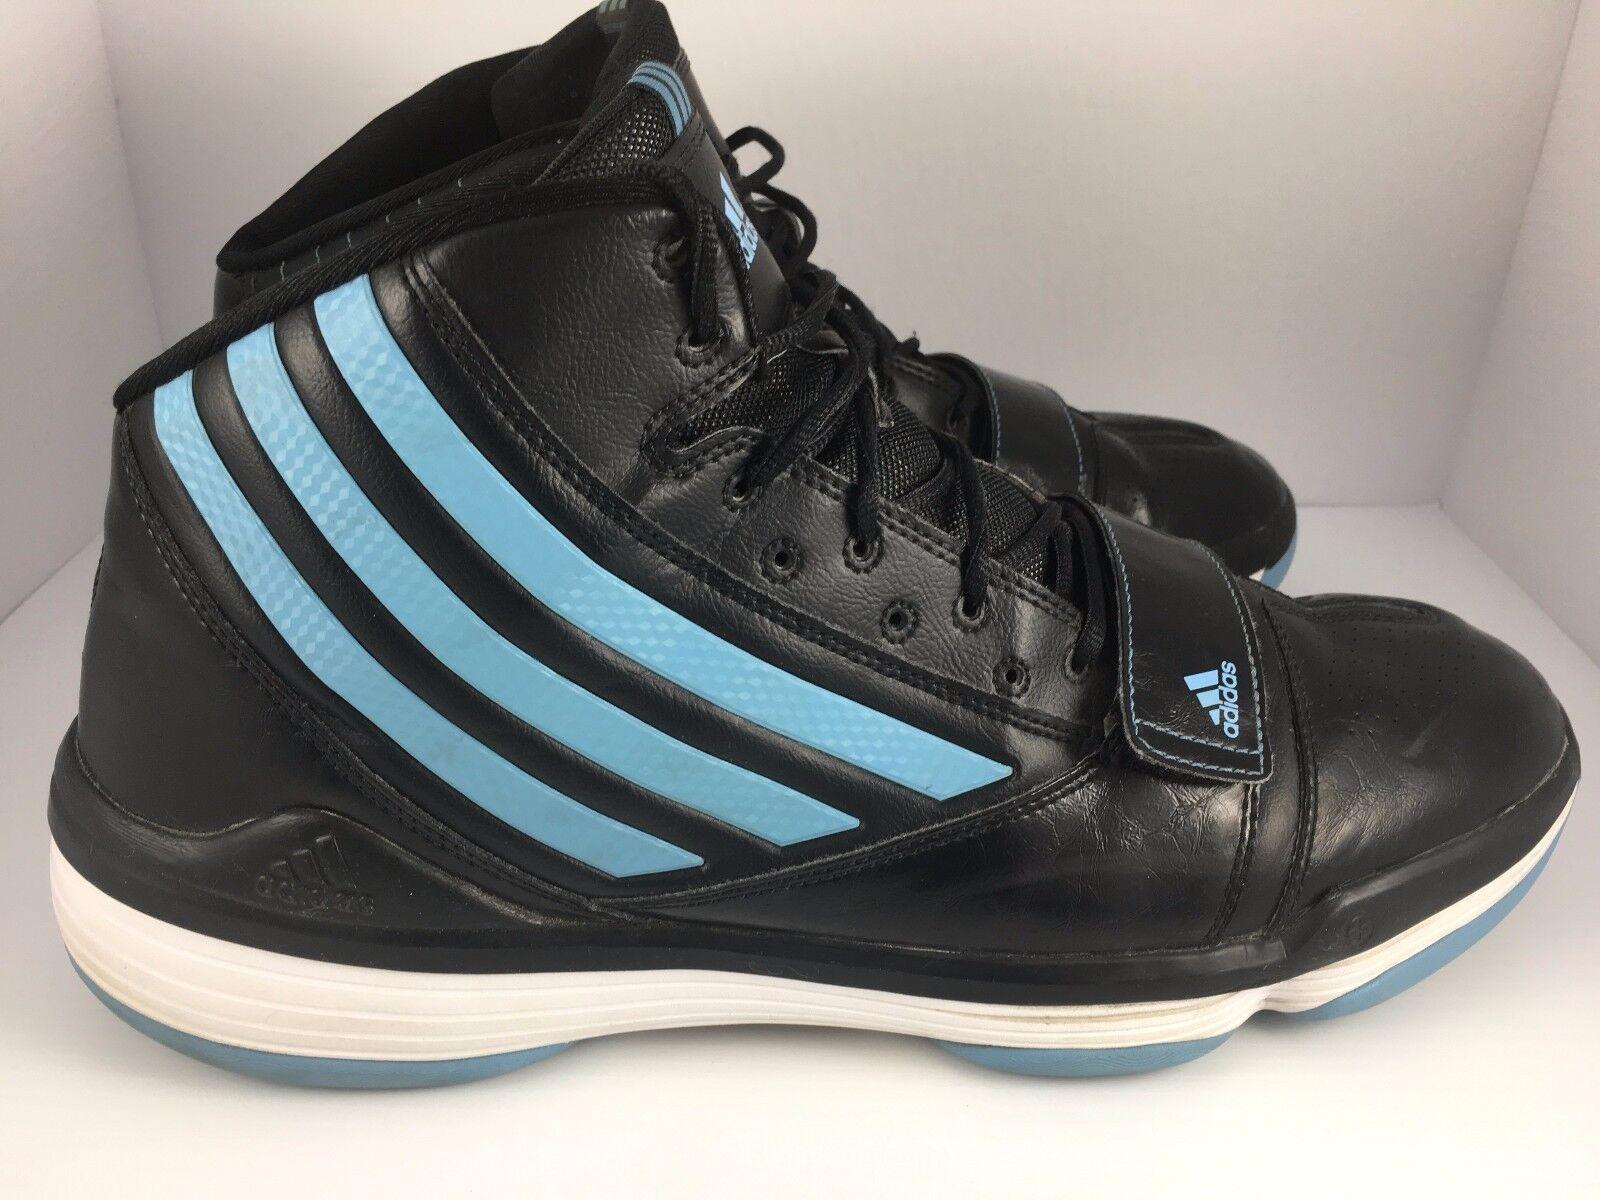 adidas männer adiprene black g09506 & blue hohe spitze schuhe g09506 black sz. ee14e8